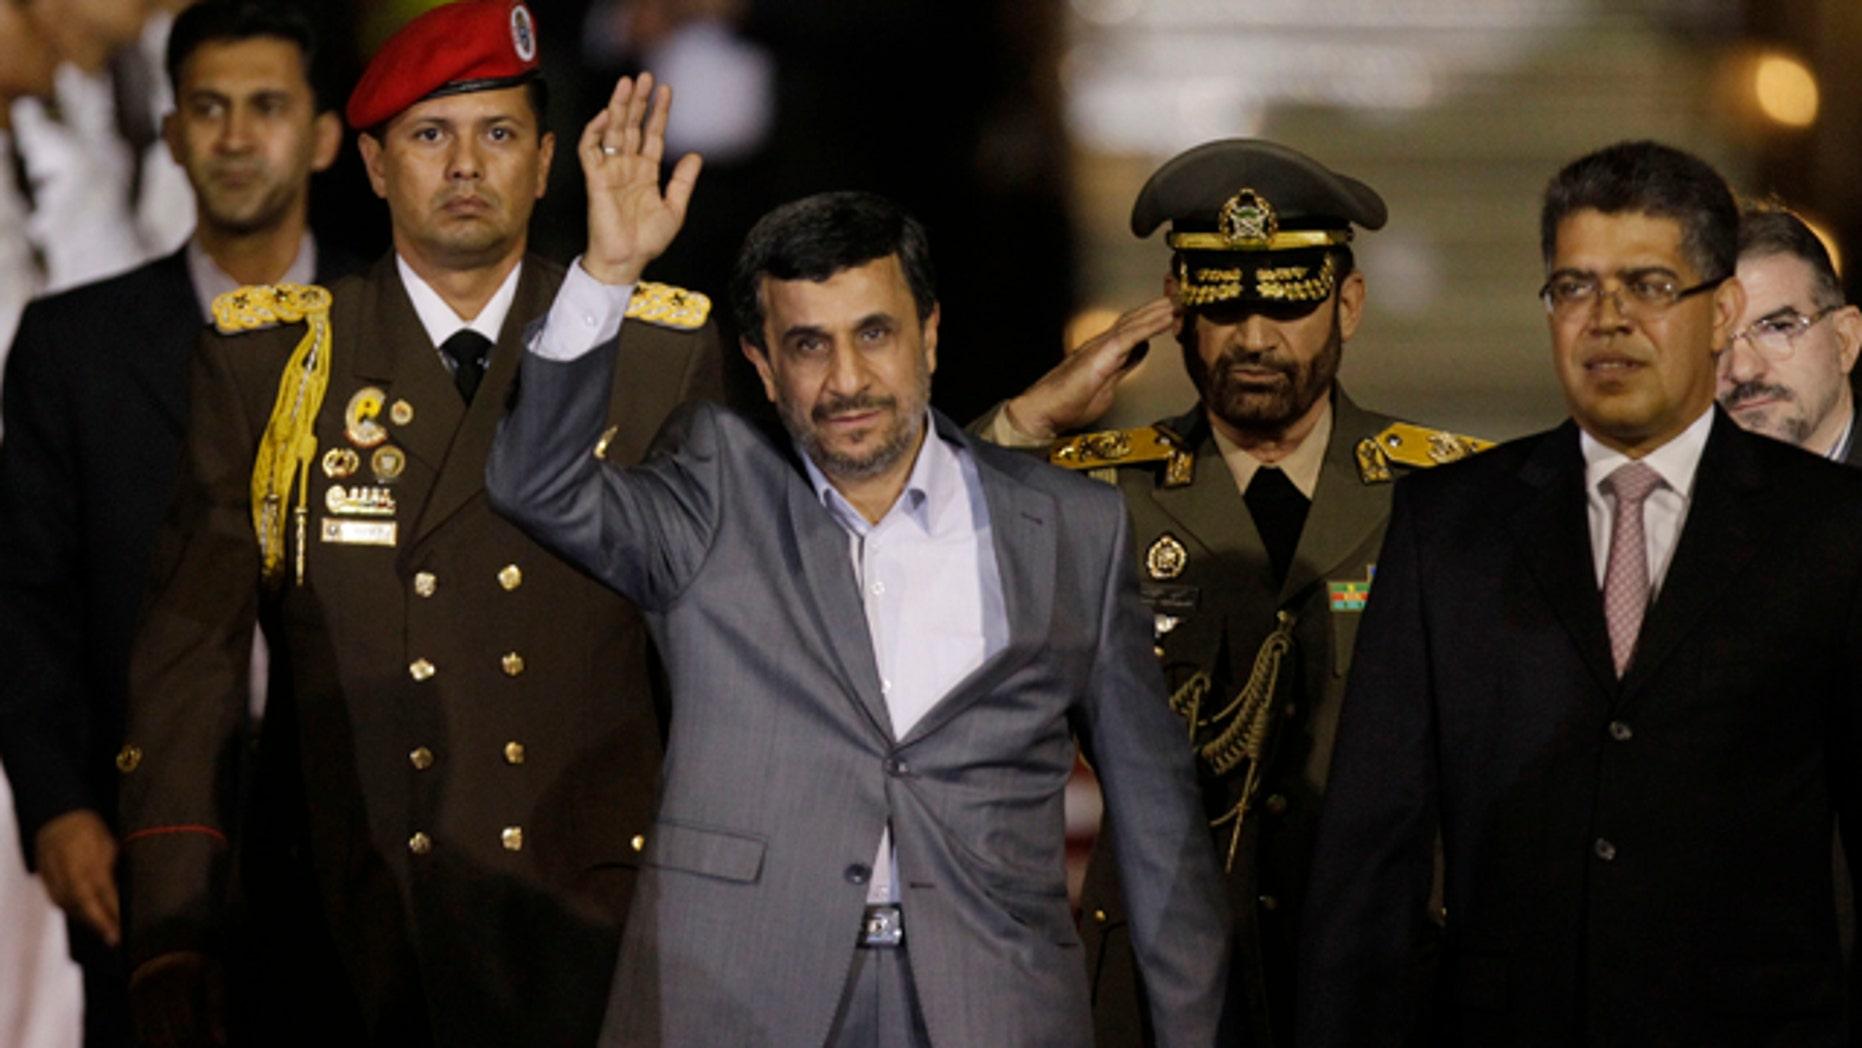 Jan. 8, 2012: Iran's President Mahmoud Ahmadinejad waves upon his arrival at the international airport in Maiquetia, Venezuela.